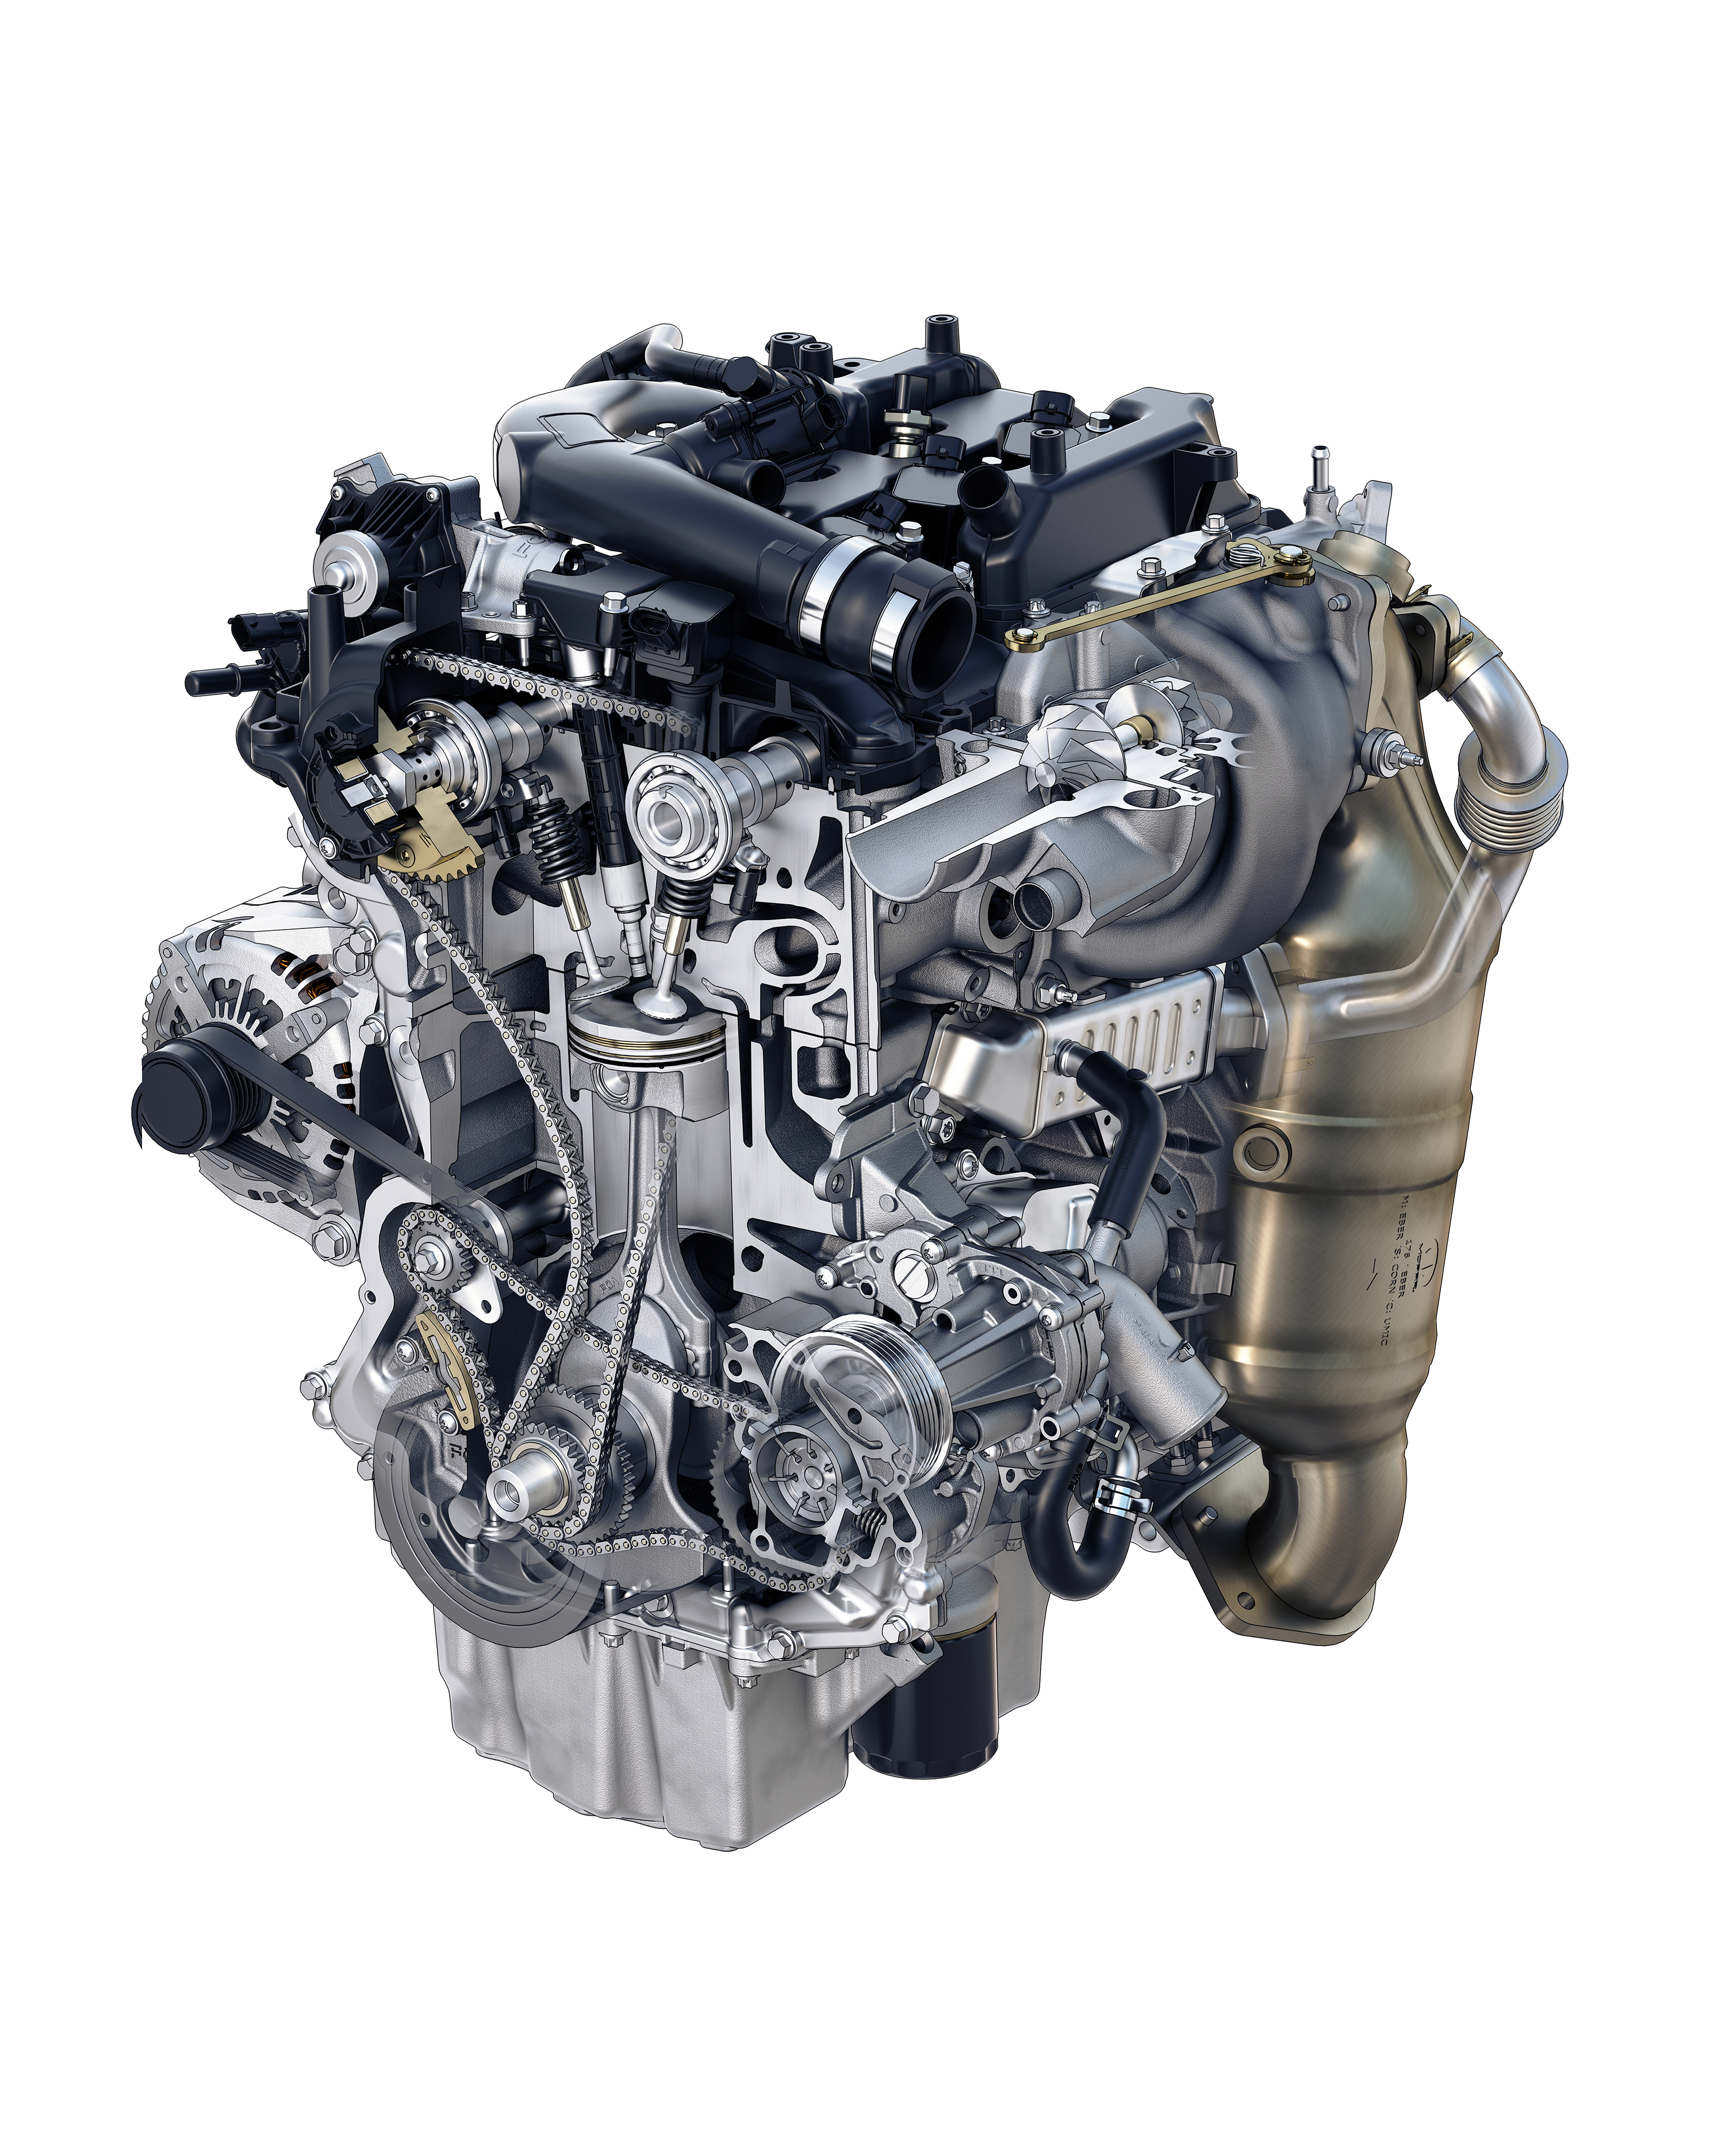 2019 Jeep Cherokee - Motore 2.0 Turbo